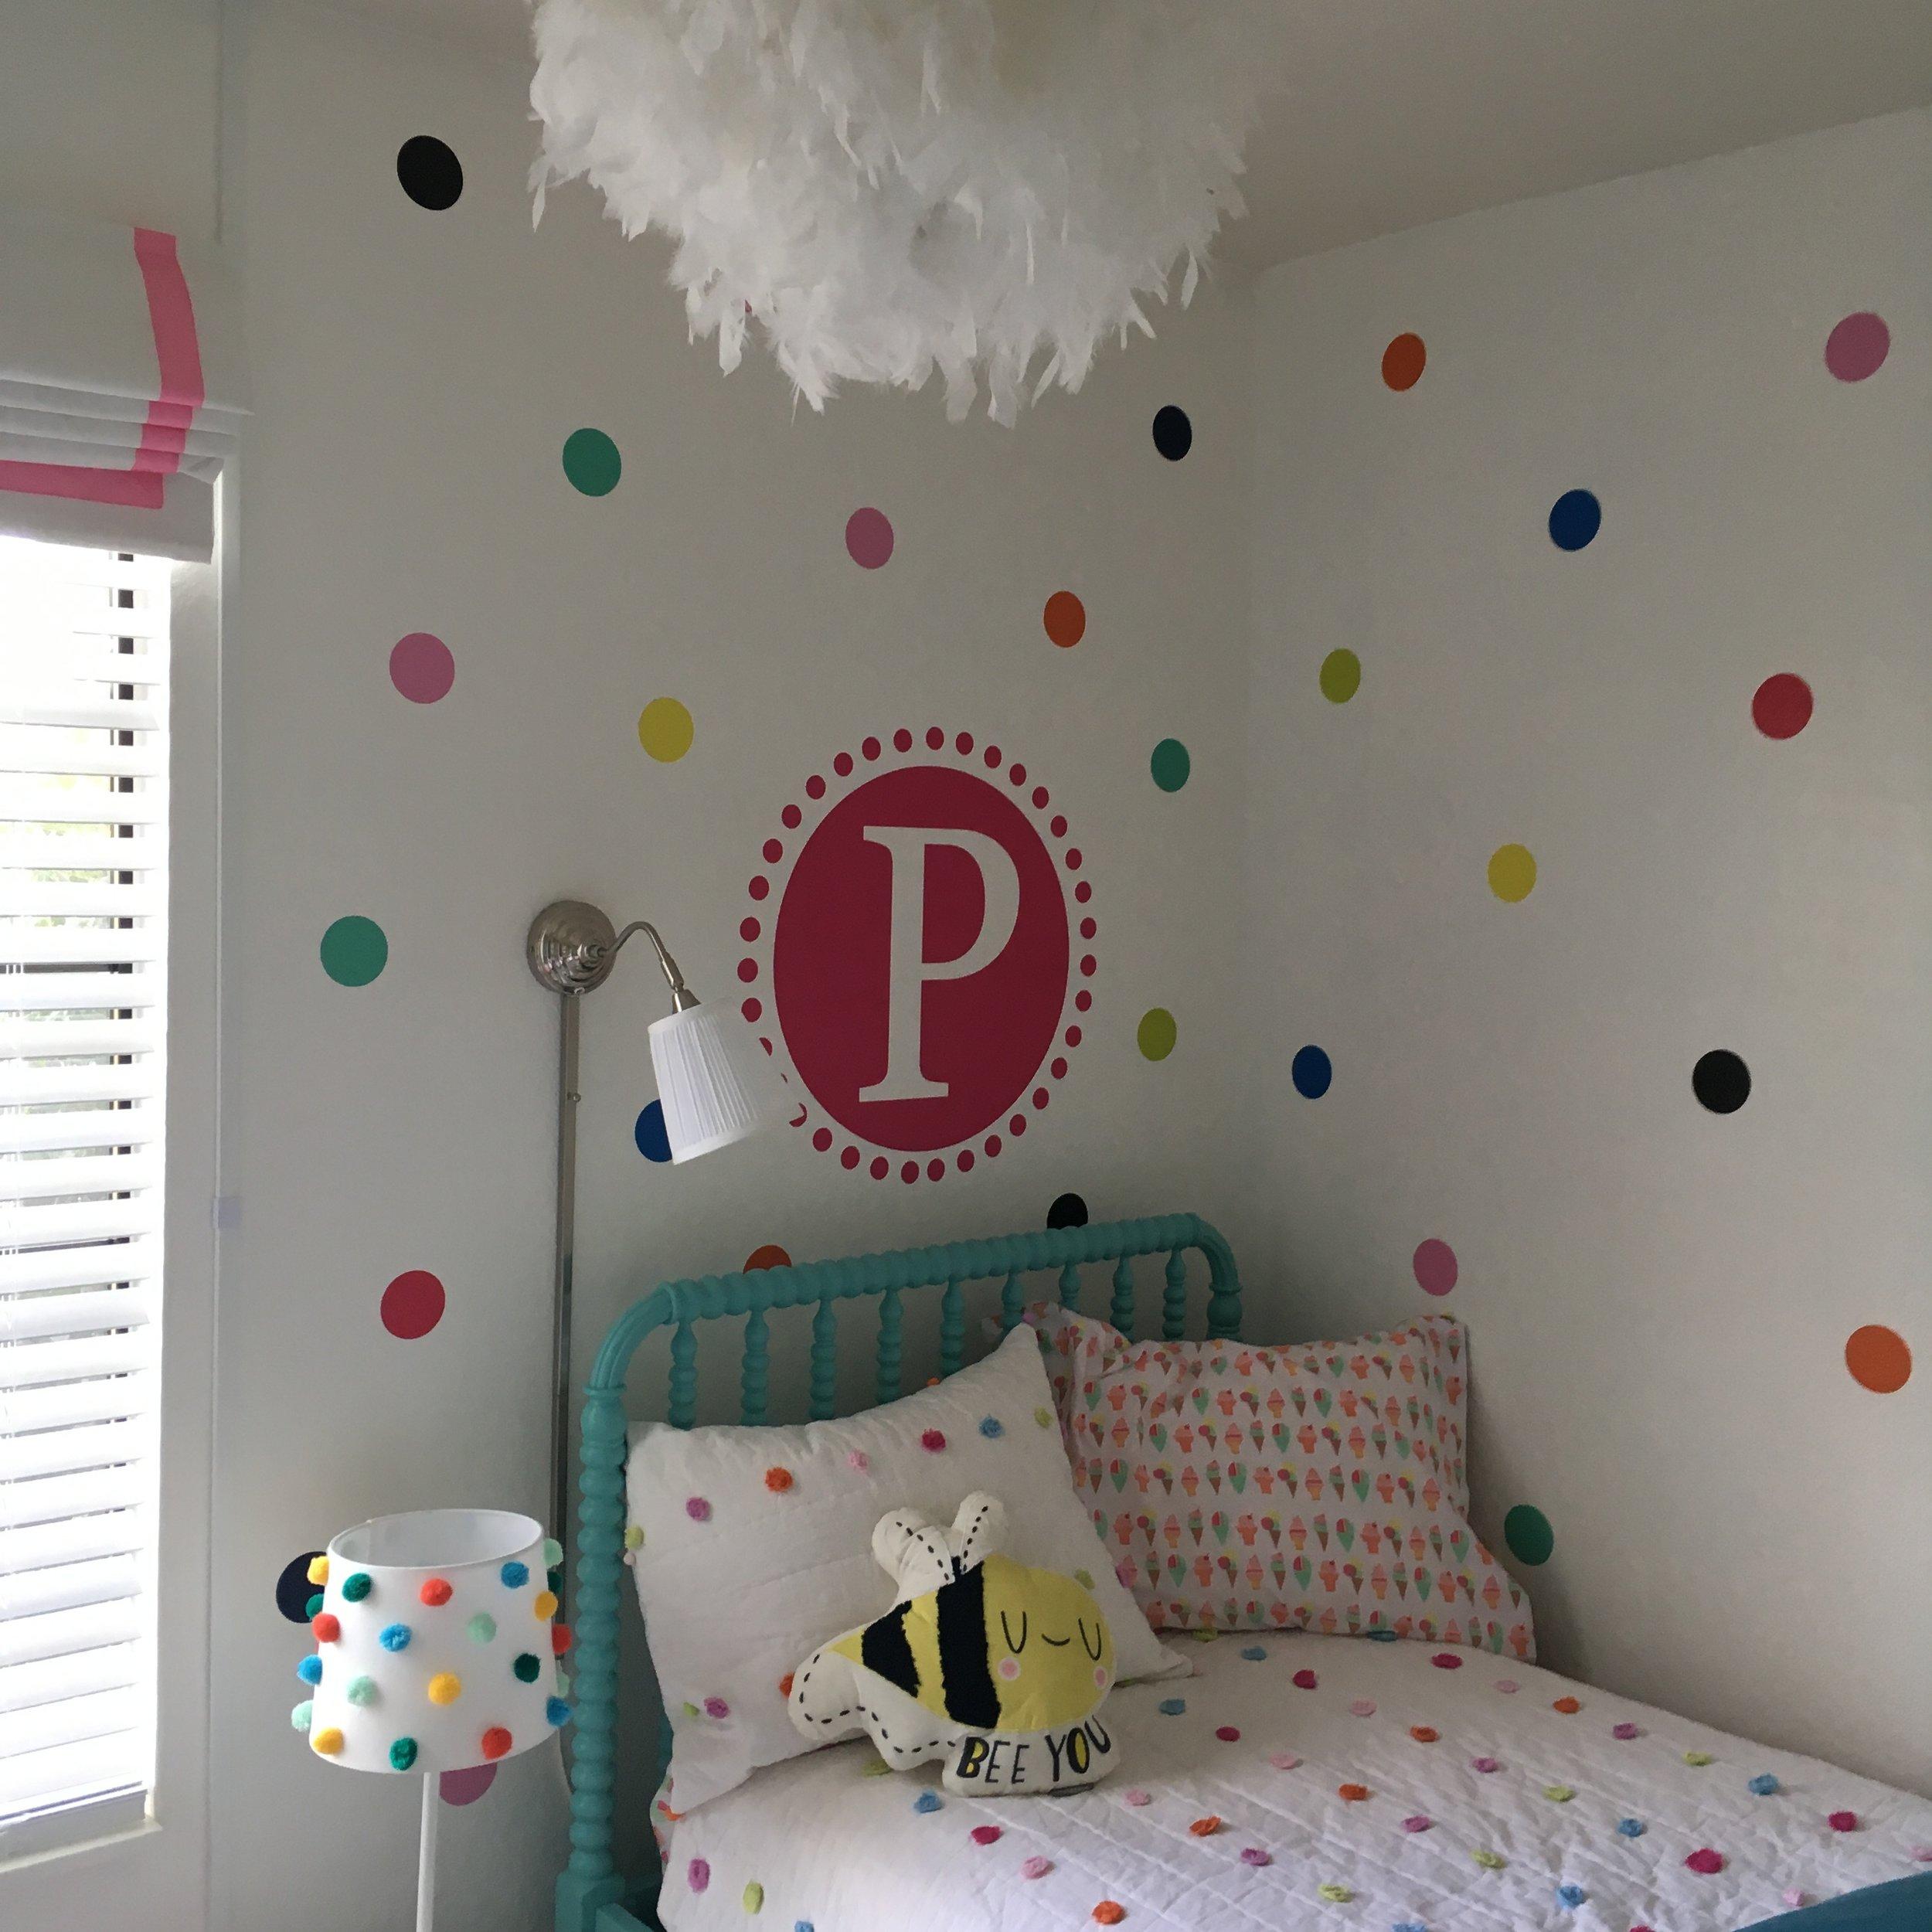 the original bgr (big girl's room) - coming soon…